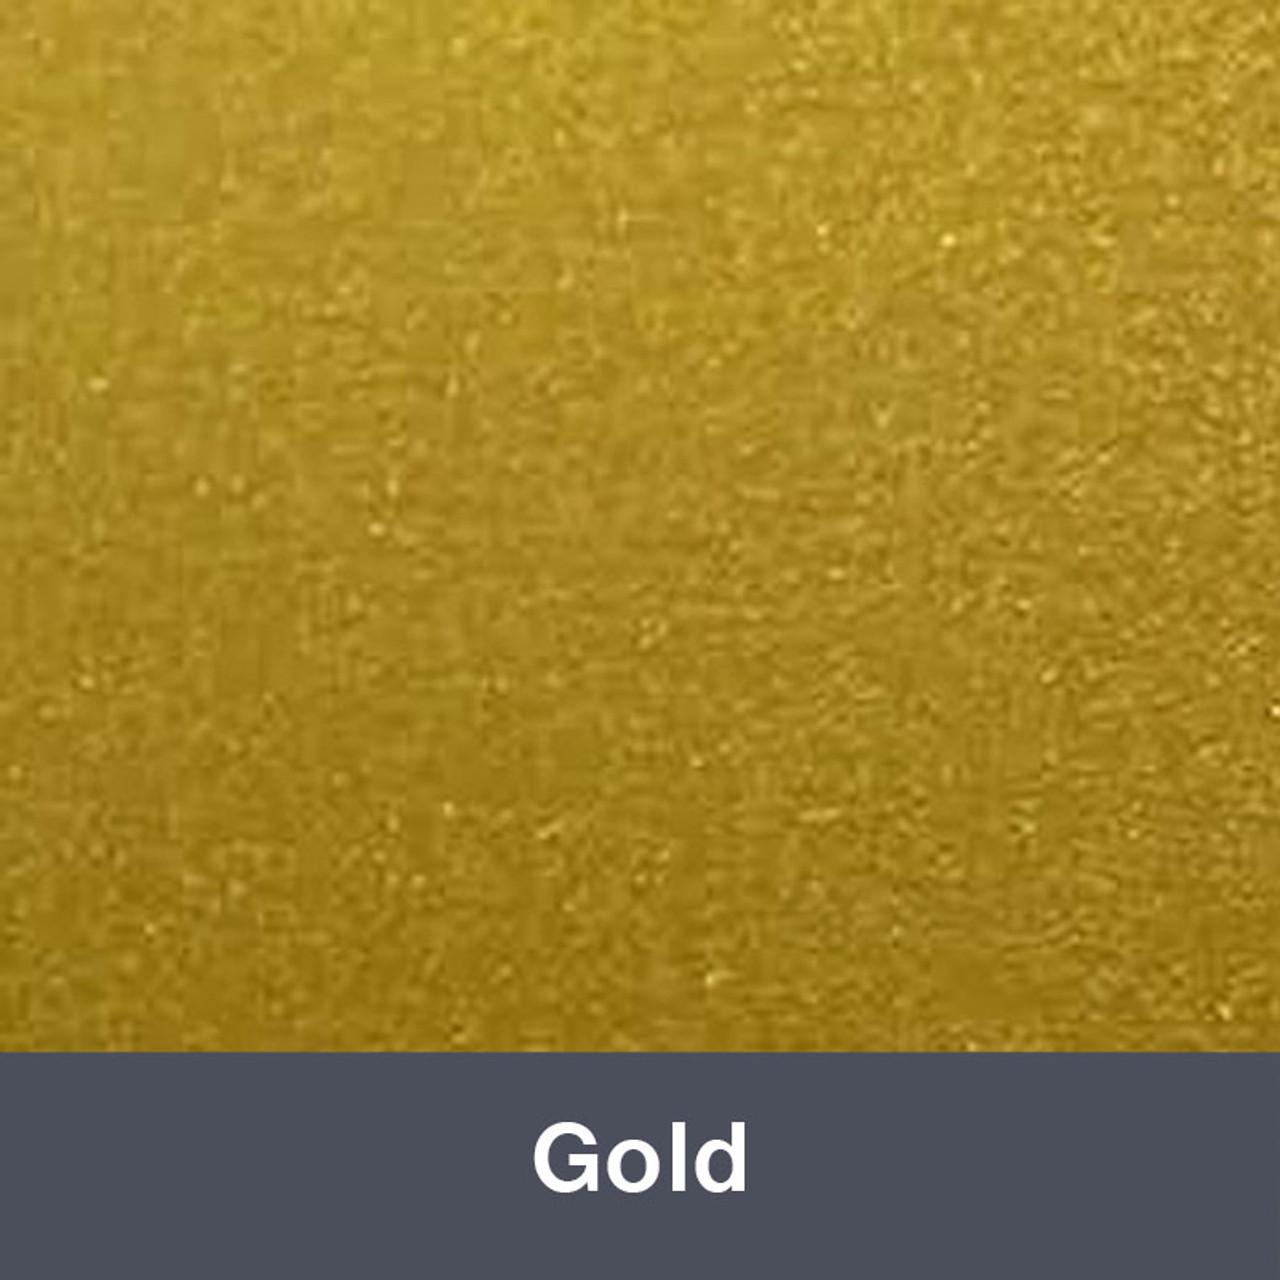 Iron-on Blockout Gold 4520s